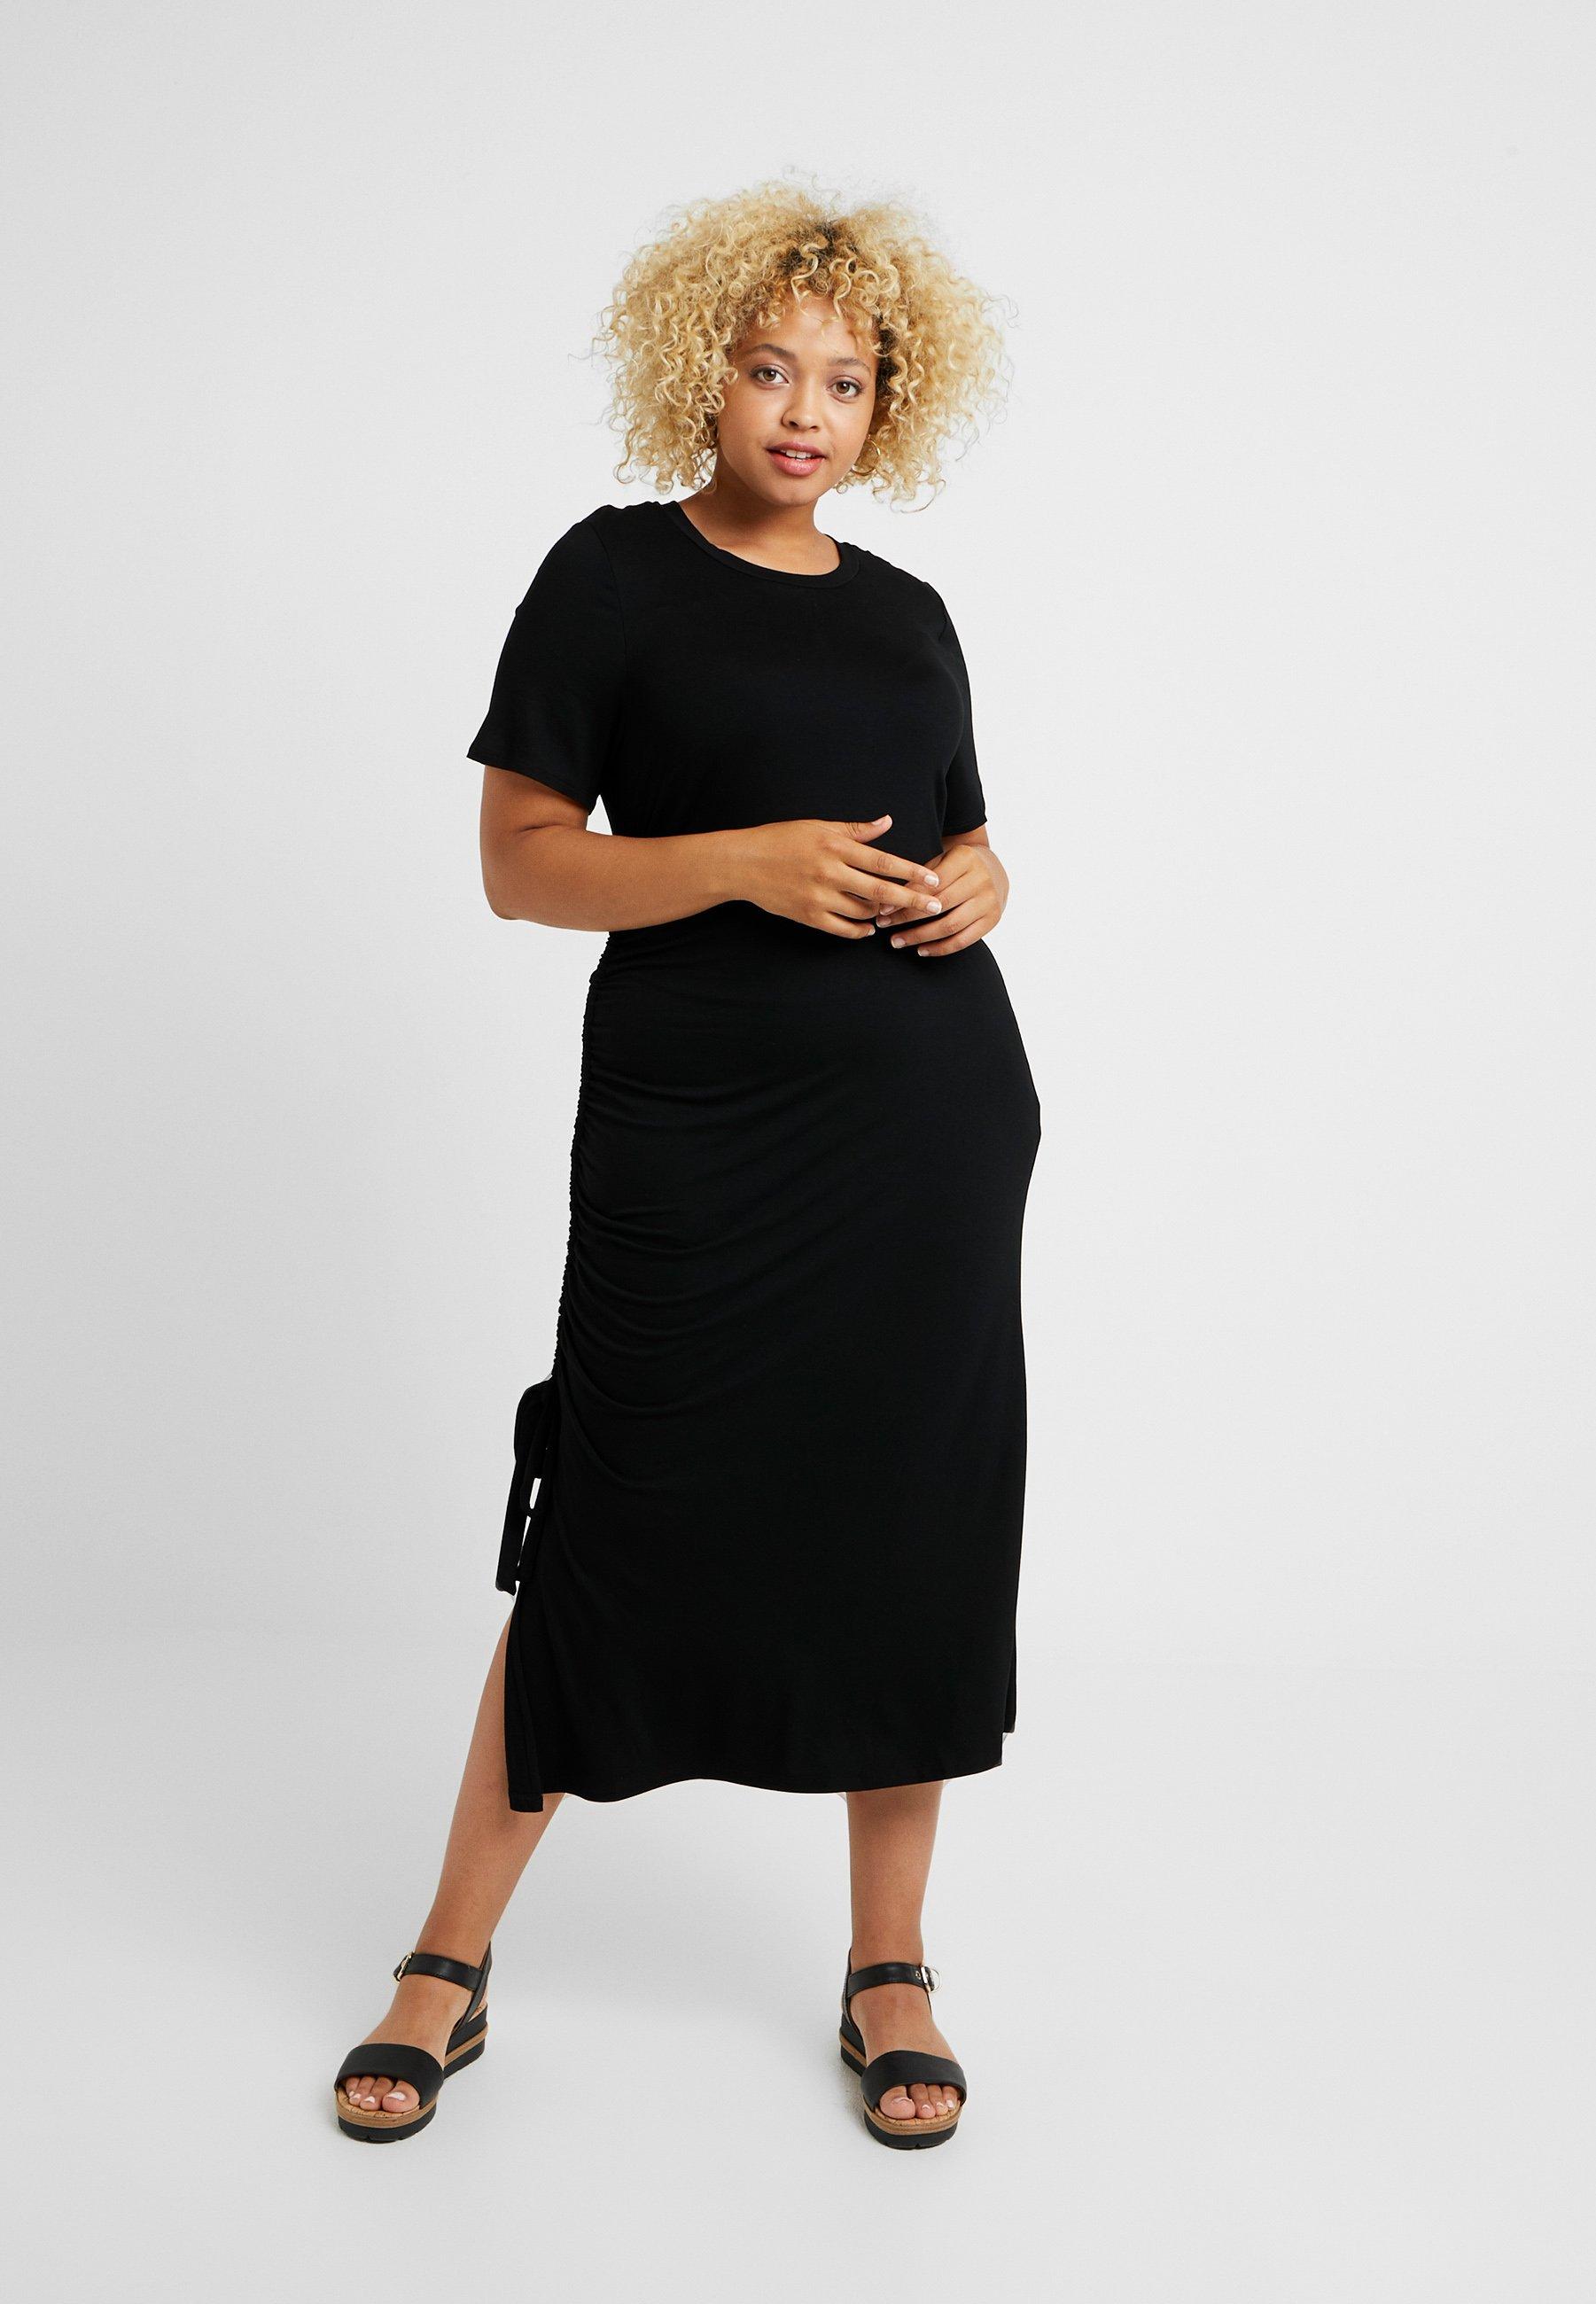 Black By Be DressRobe Side D'été Simply Capsule Ruched sQCdhxrt